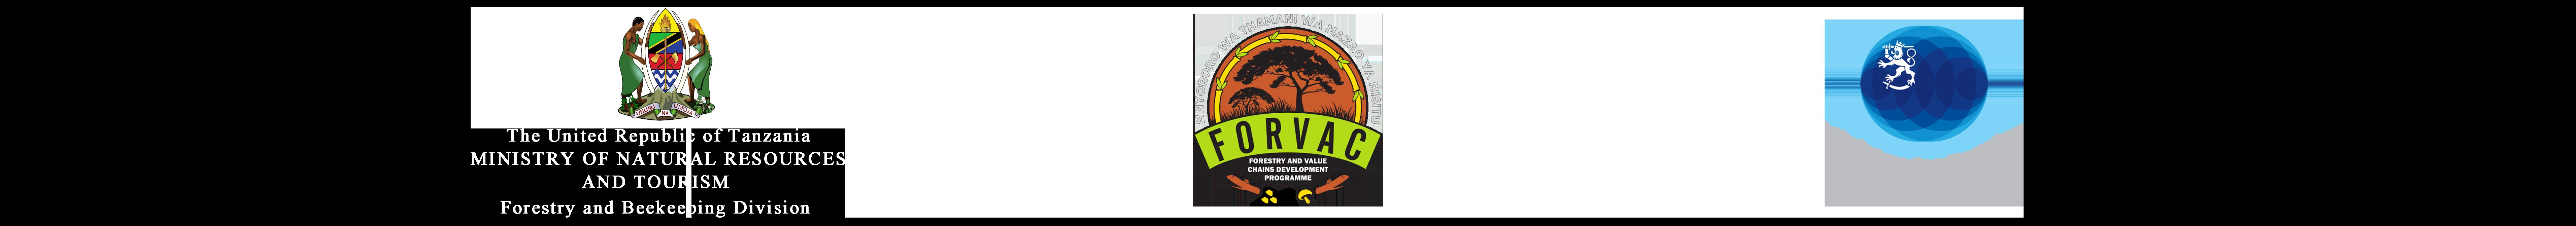 Forvac